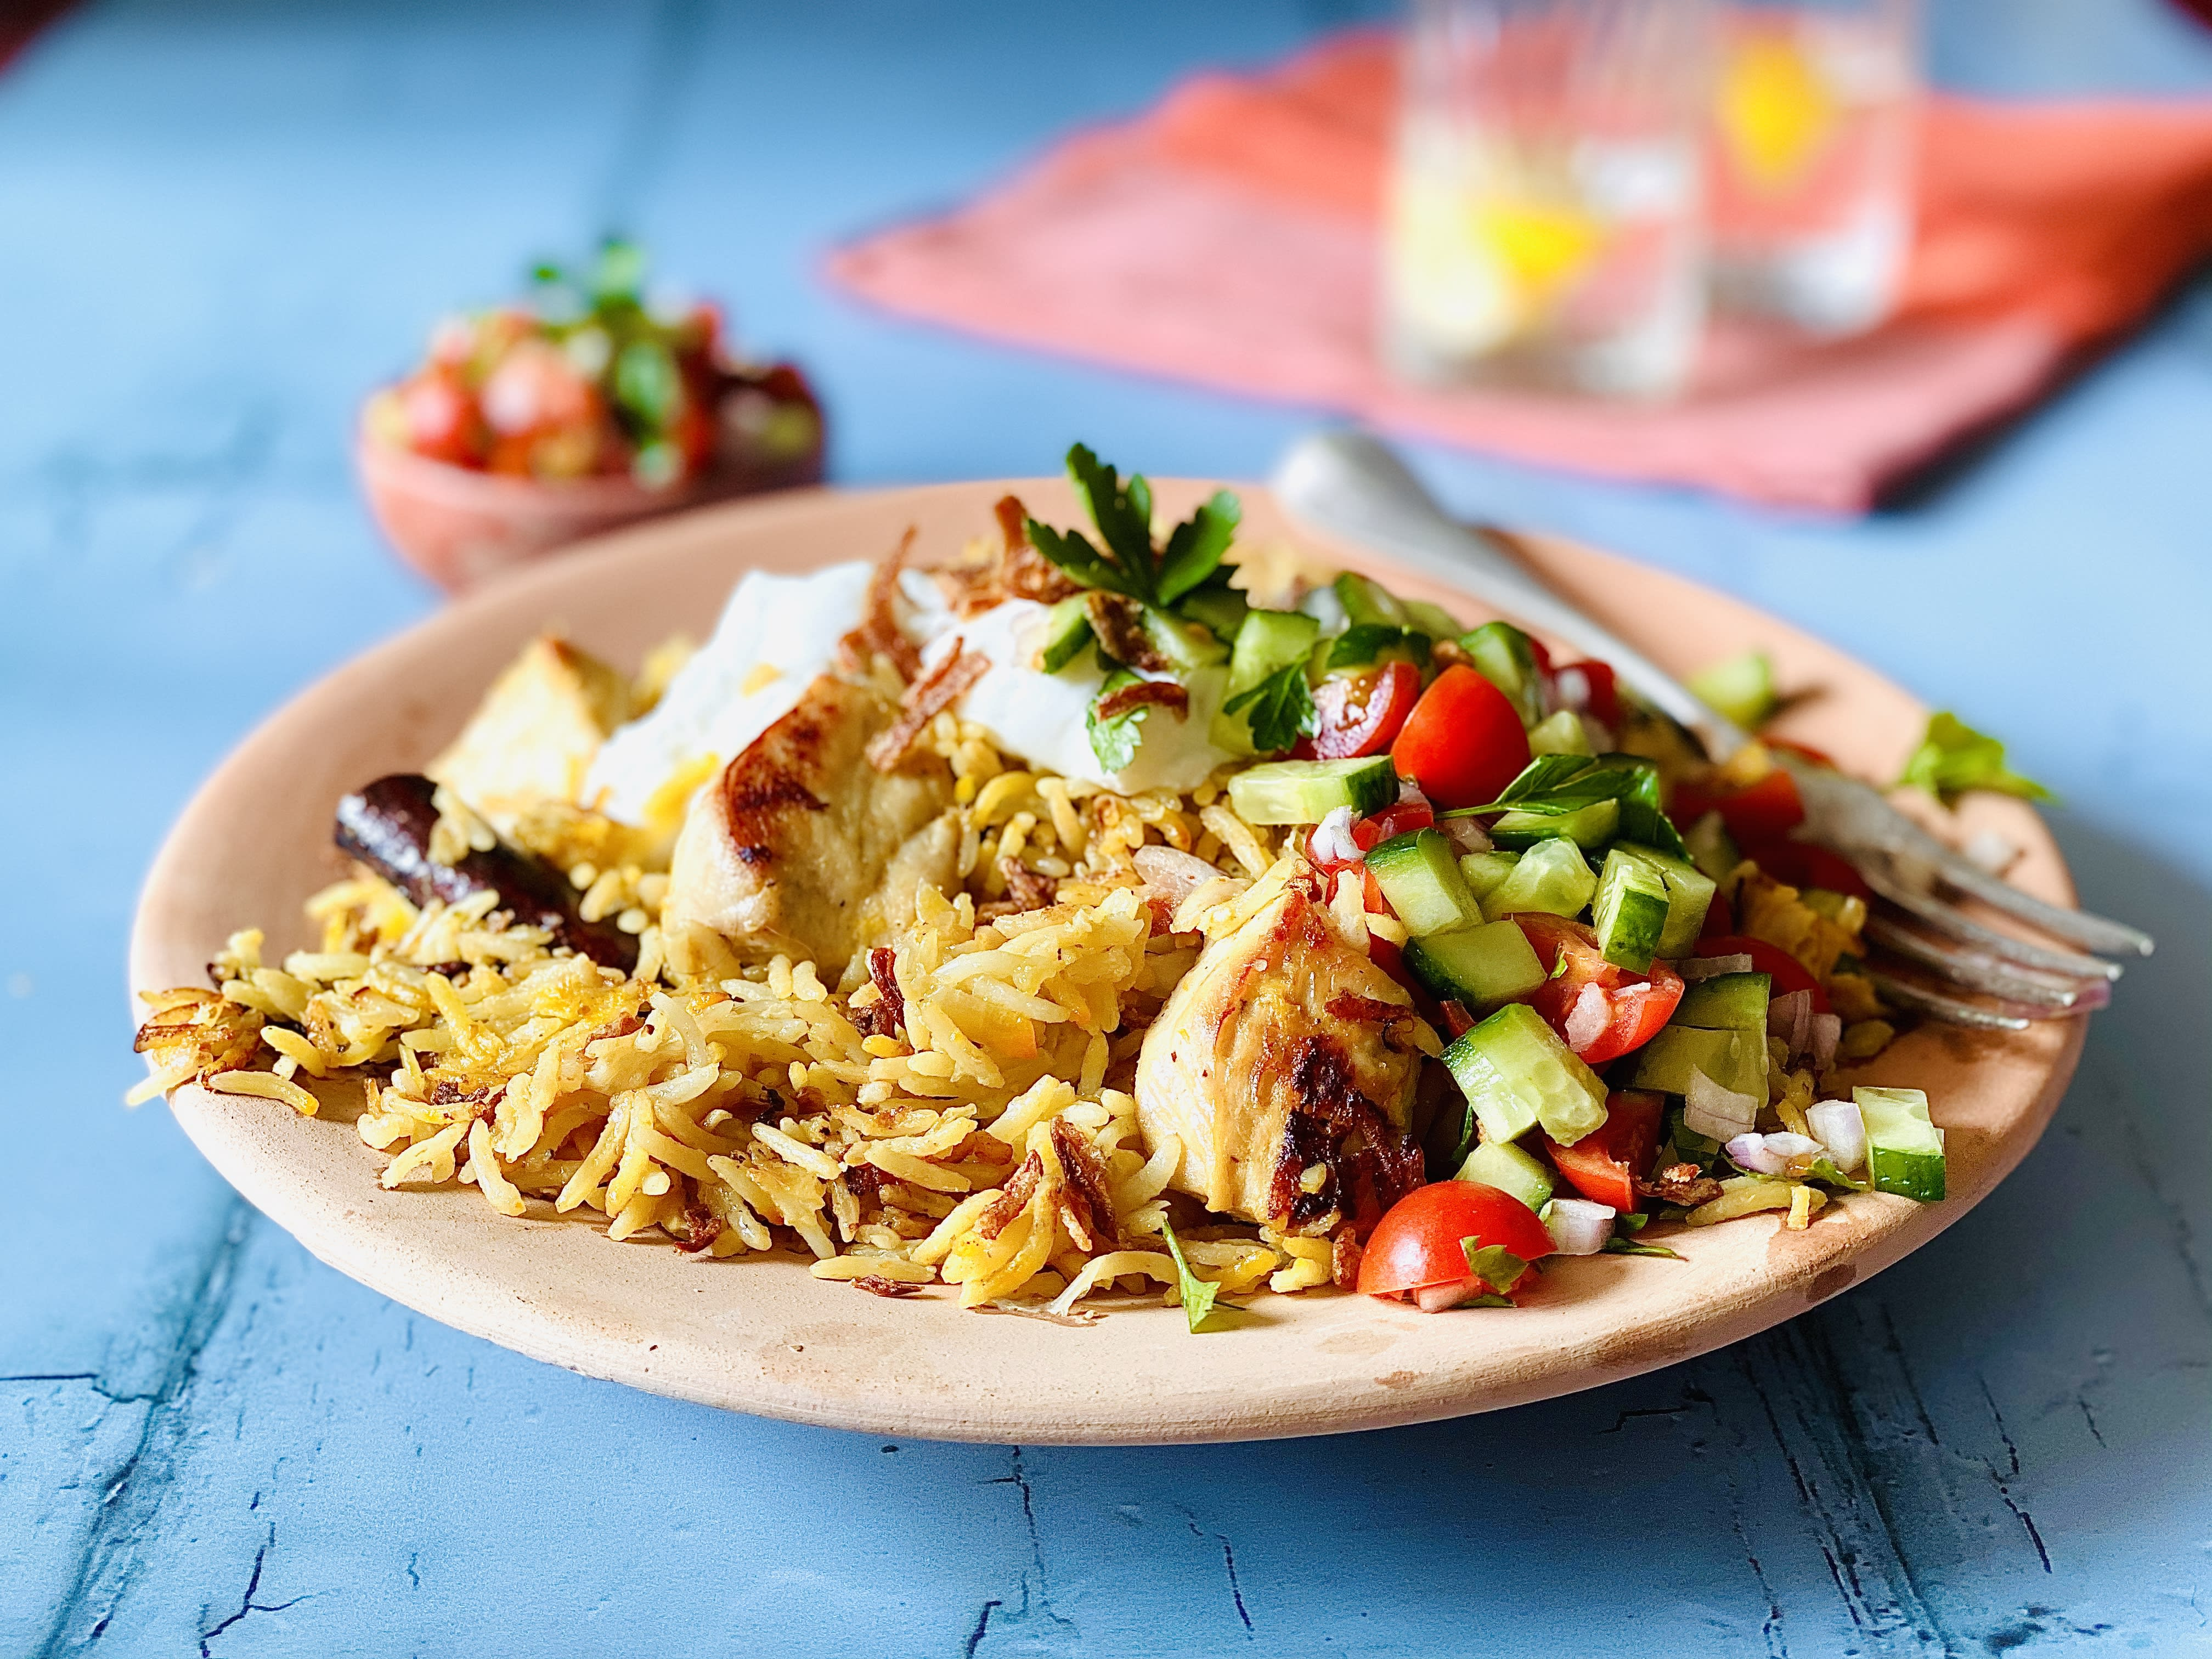 Chicken and Saffron Pilaf with Shirazi Salad